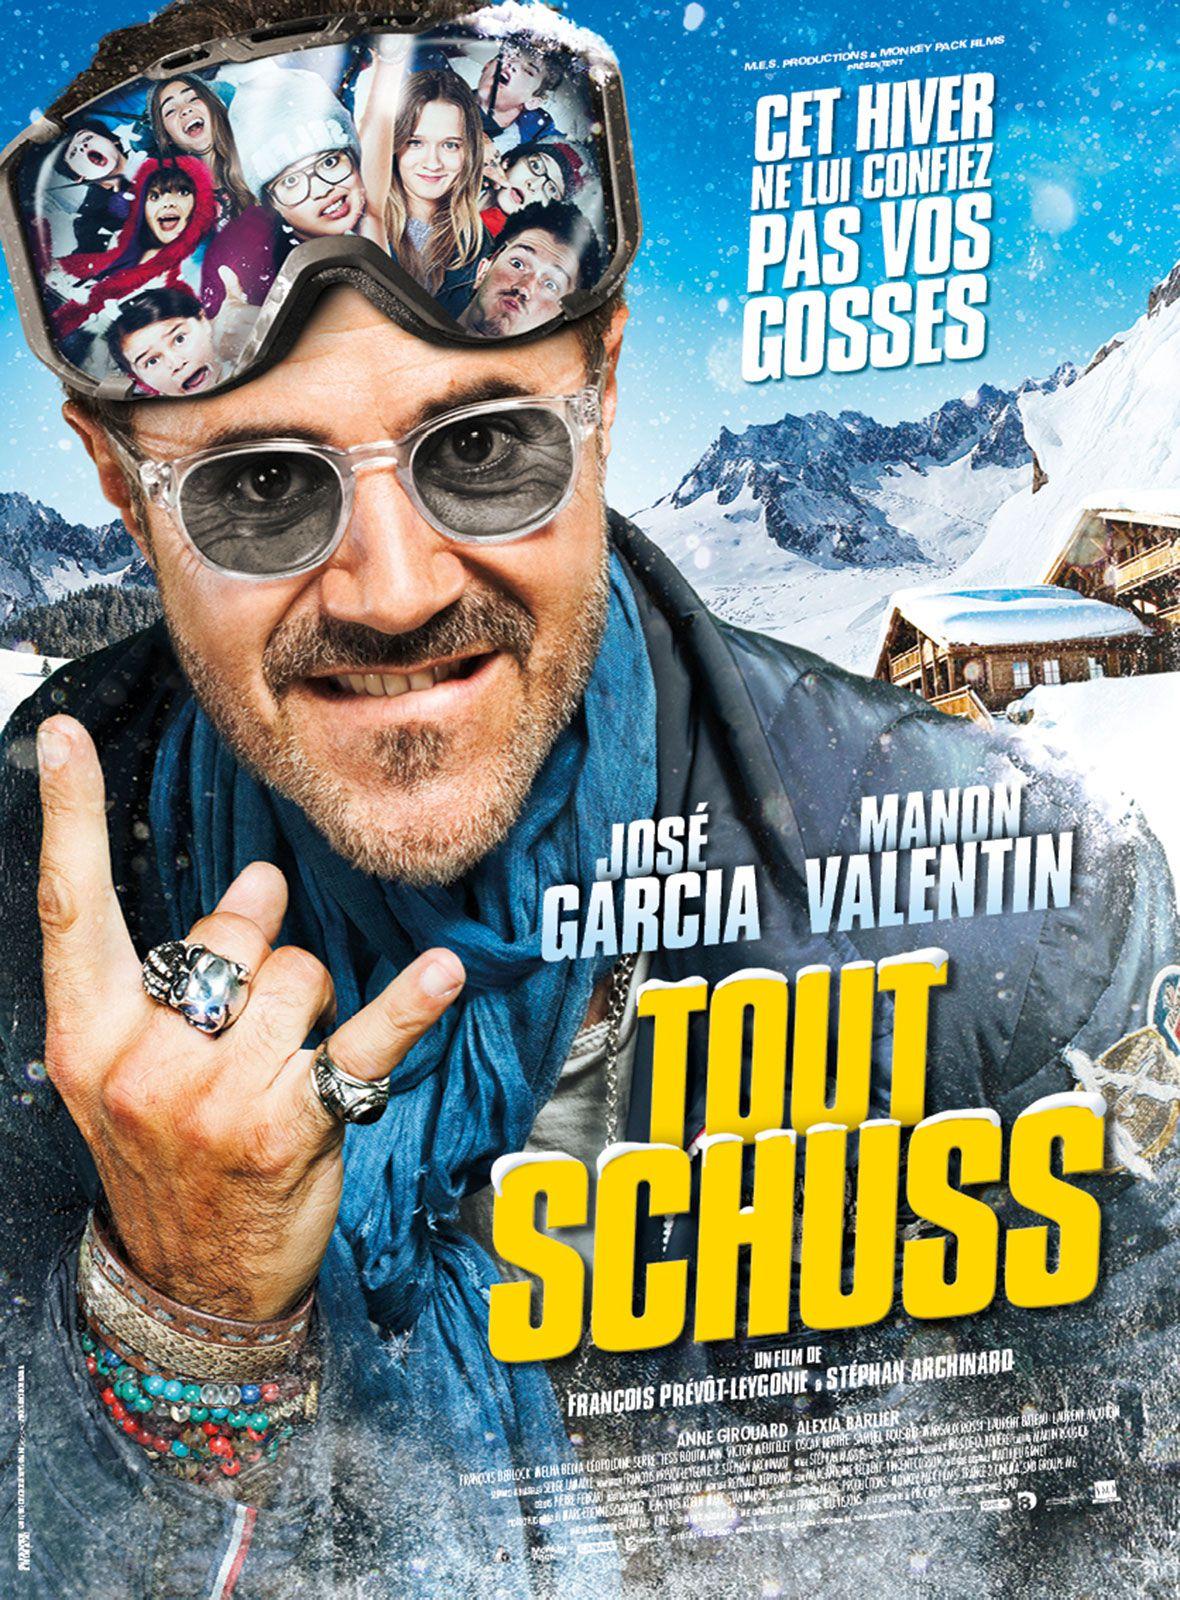 Tout schuss - Film (2016)